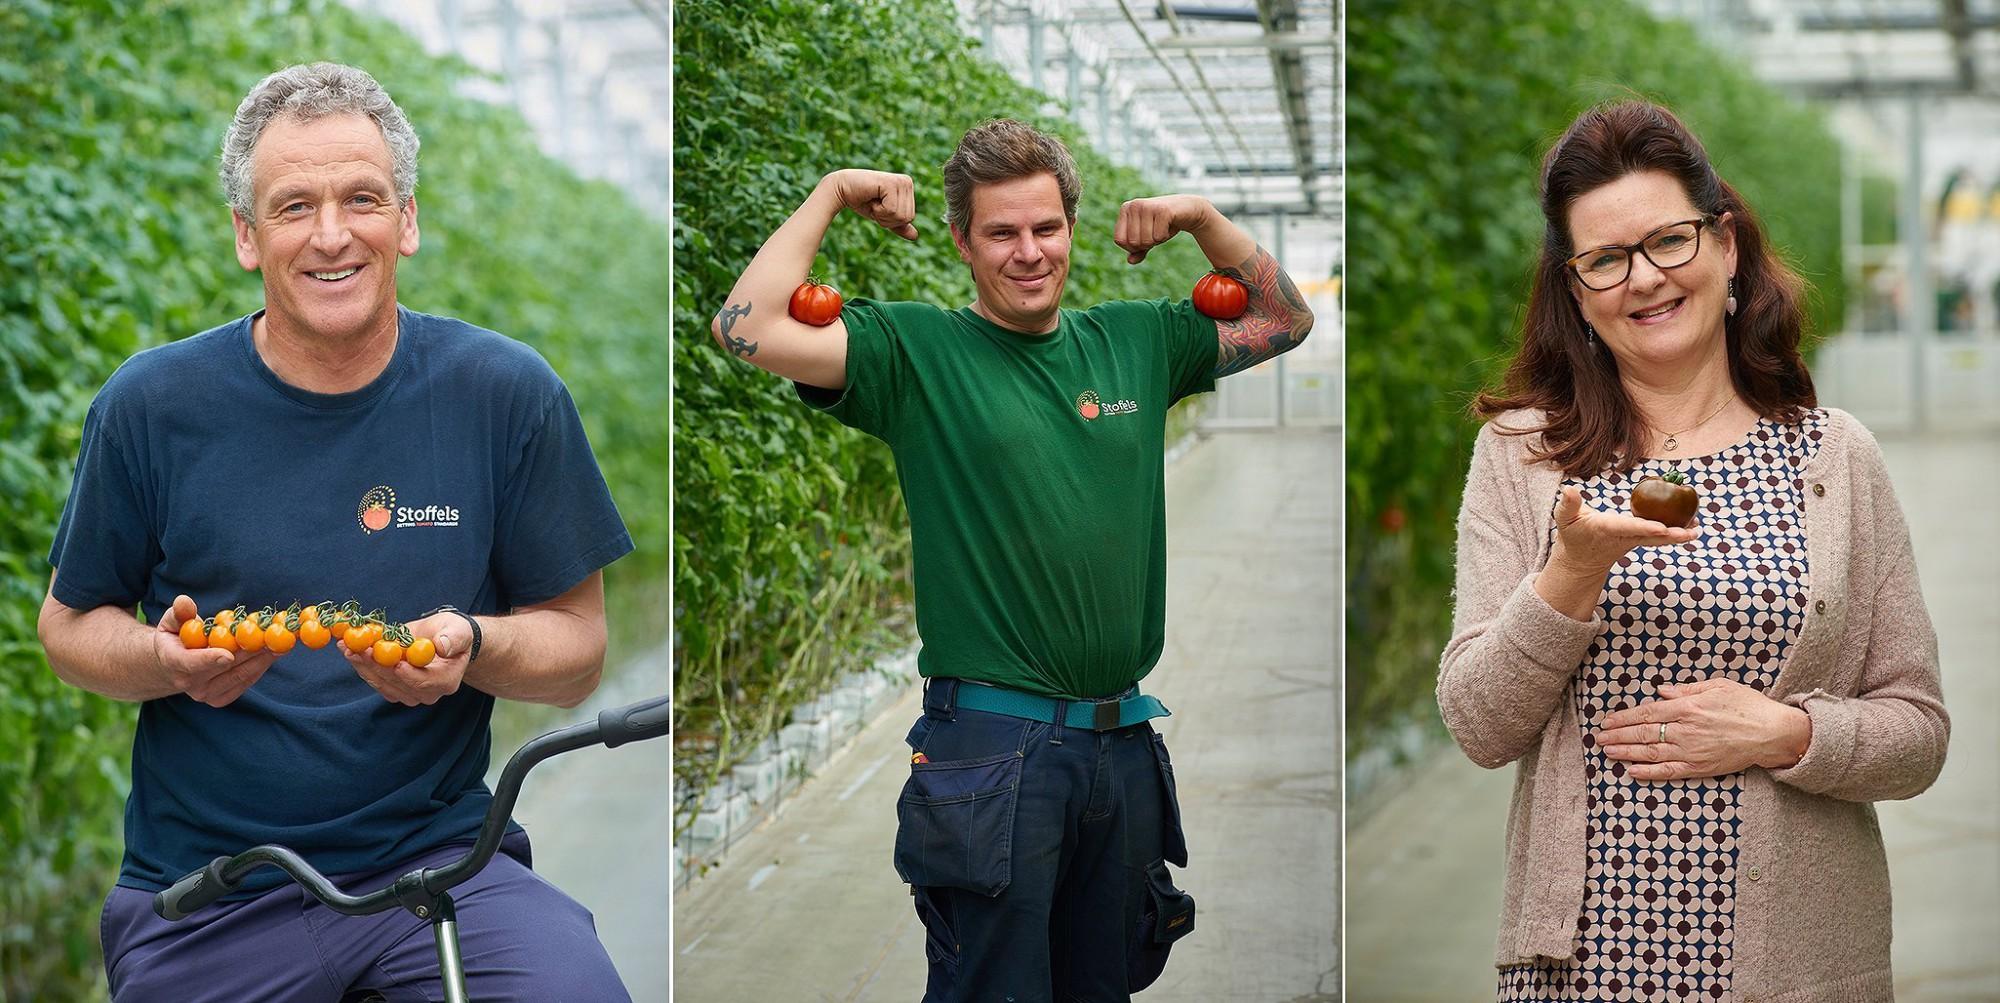 Afbeelding: Fotografie medewerkers Stoffels tomaten, met hun favoriete tomaat.